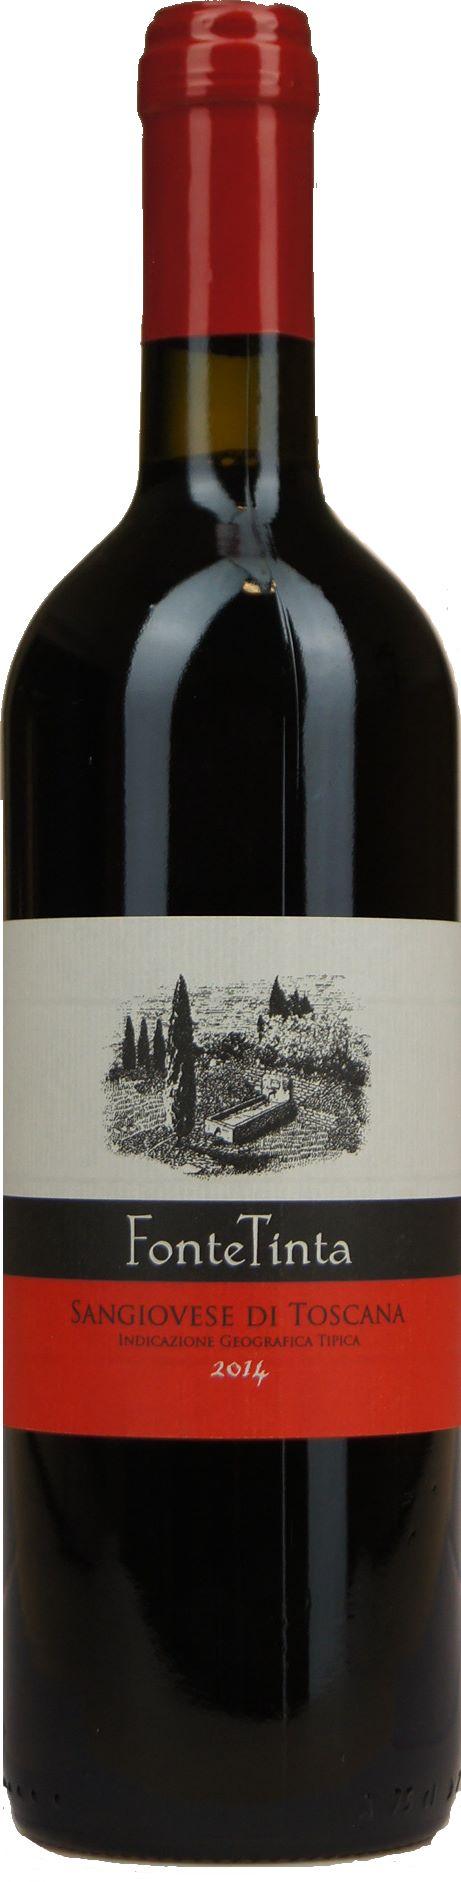 Fonte Tinta Sangiovese Di Toscana I G T Dewit Wijnen Rode Wijn Wijn